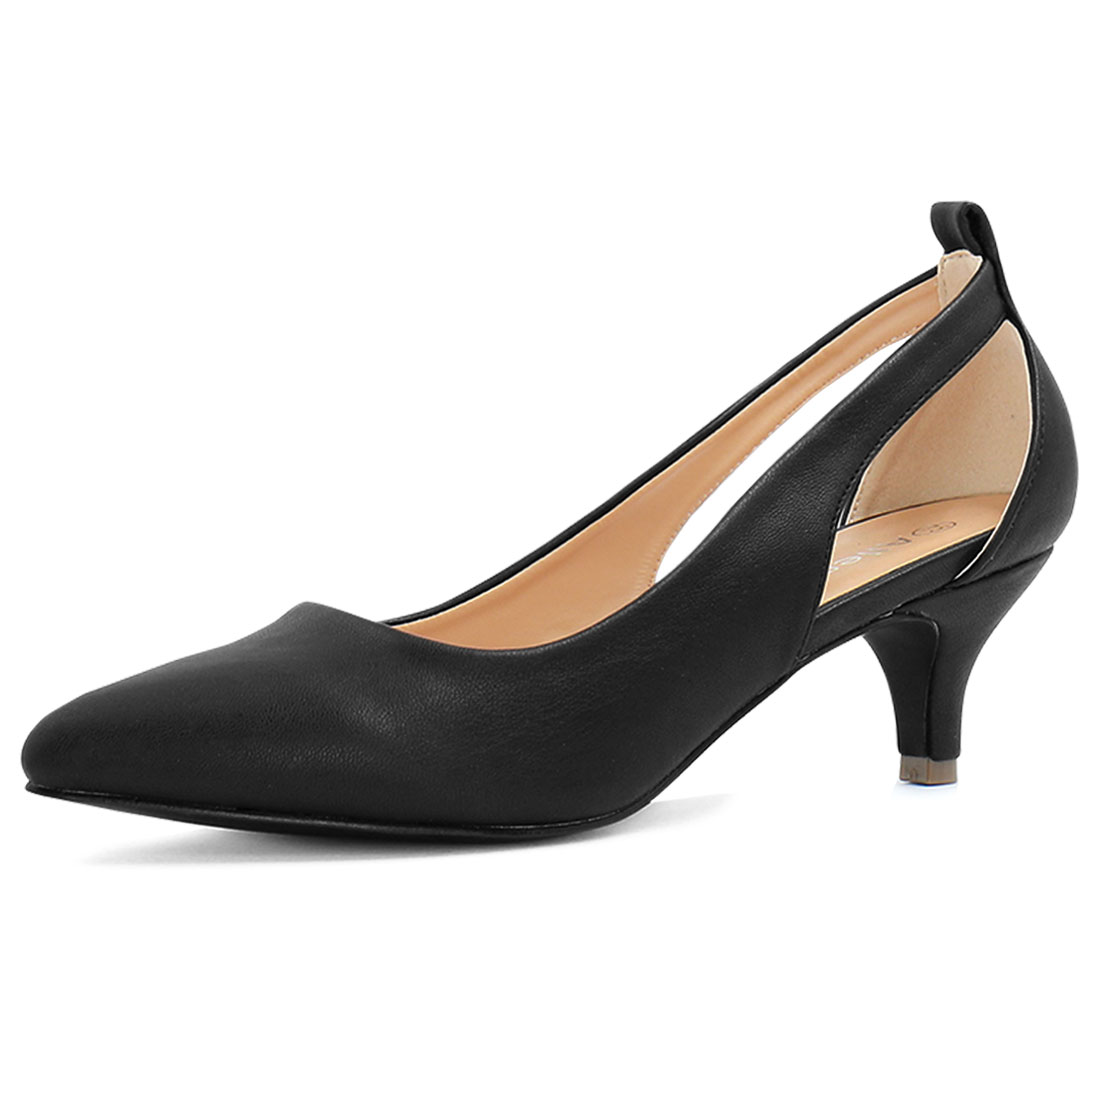 Allegra K Women's Cutout Sides Pointed Toe Kitten Heel Pumps Black US 6.5